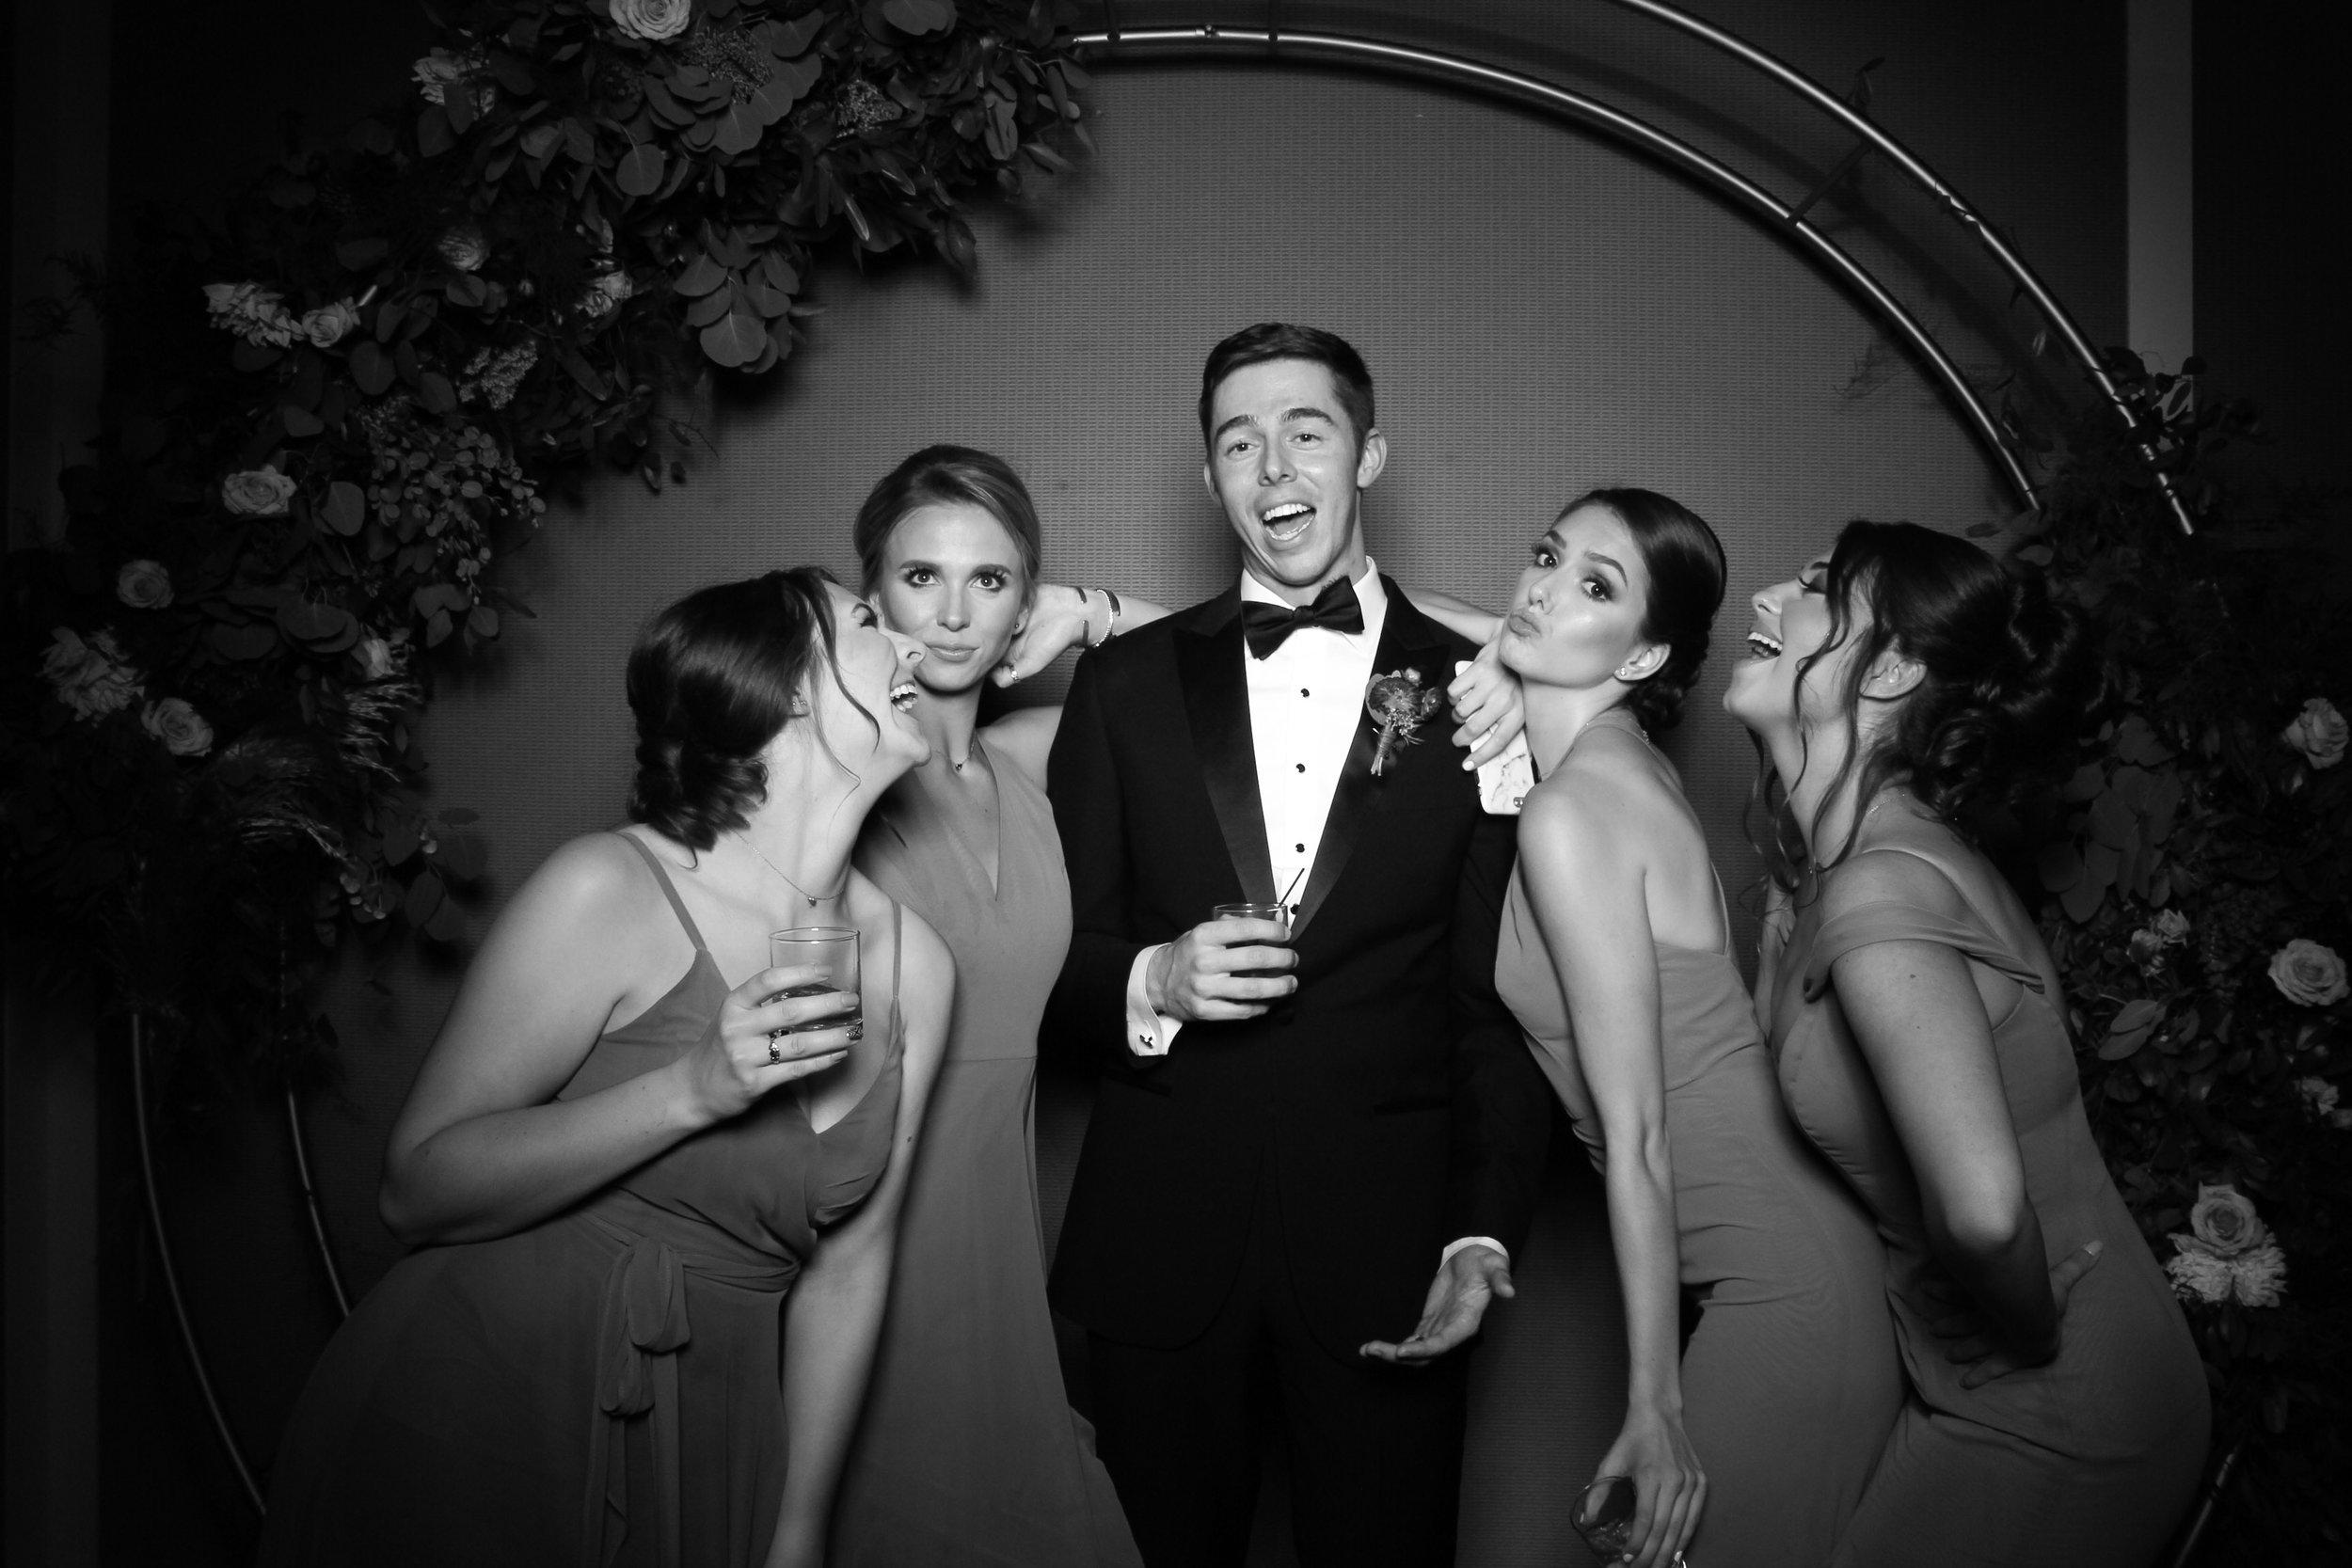 Metropolis_Ballroom_Wedding_Arlington_Heights_Photo_Booth_22.jpg